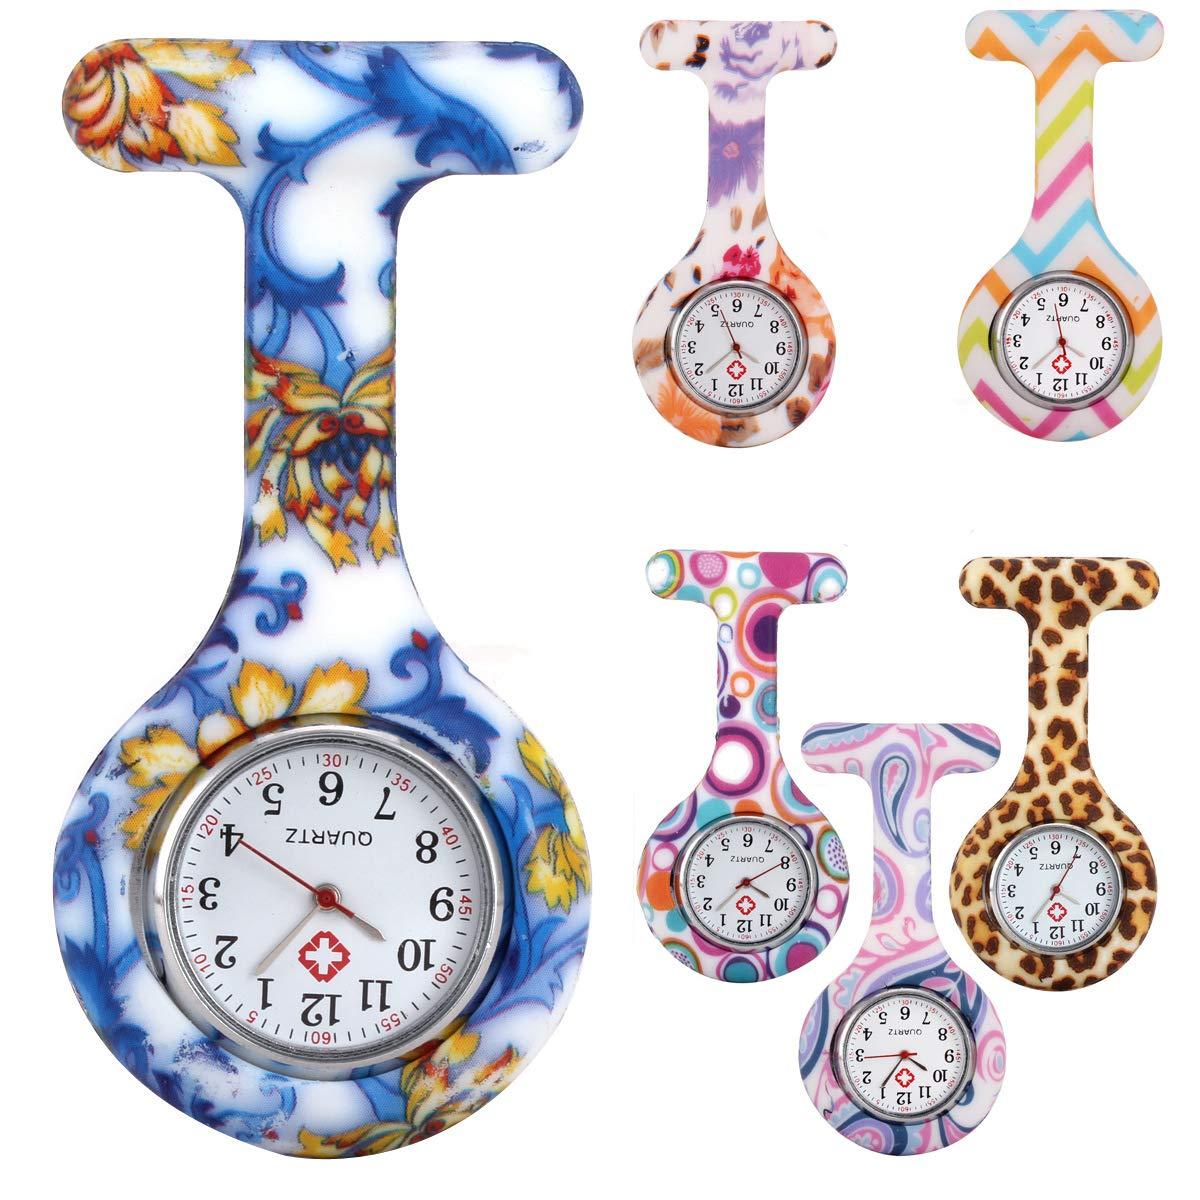 NYKKOLA Nurse Watch Brooch, Silicone/Canvas/Metal with Pin/Clip,Infection Control Design, Health Care Nurse Doctor Paramedic Medical Brooch Fob Watch(6 PCS)